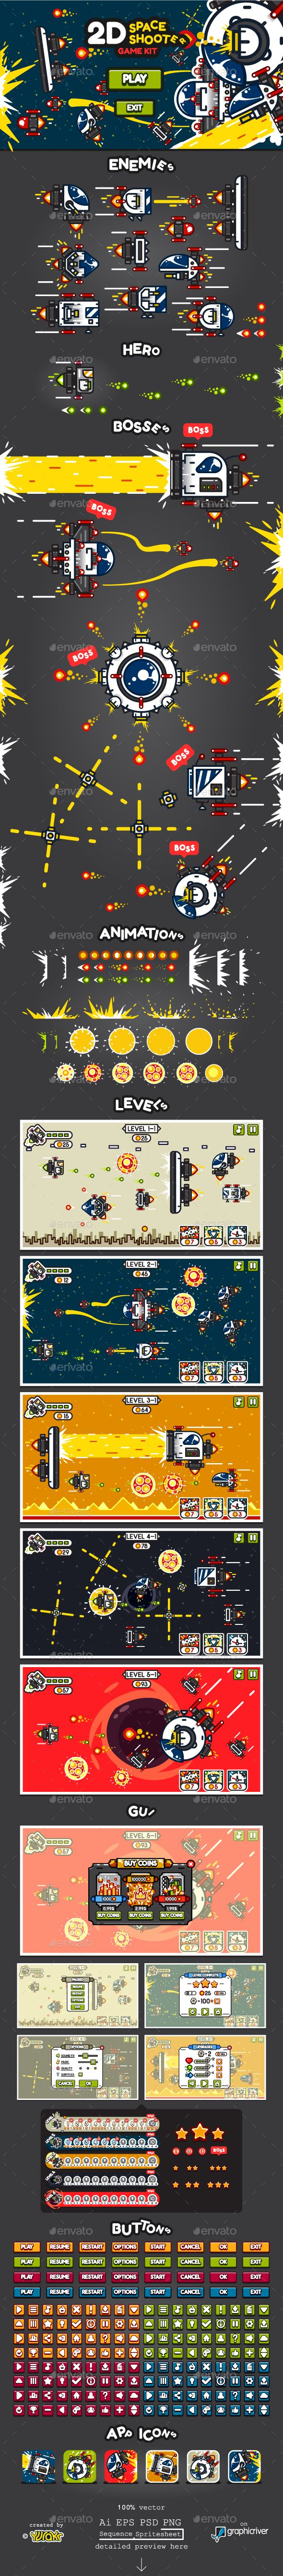 2D Space Shooter Game Kit Download link: https://graphicriver.net/item/2d-space-shooter-game-kit/19877493?ref=klitz